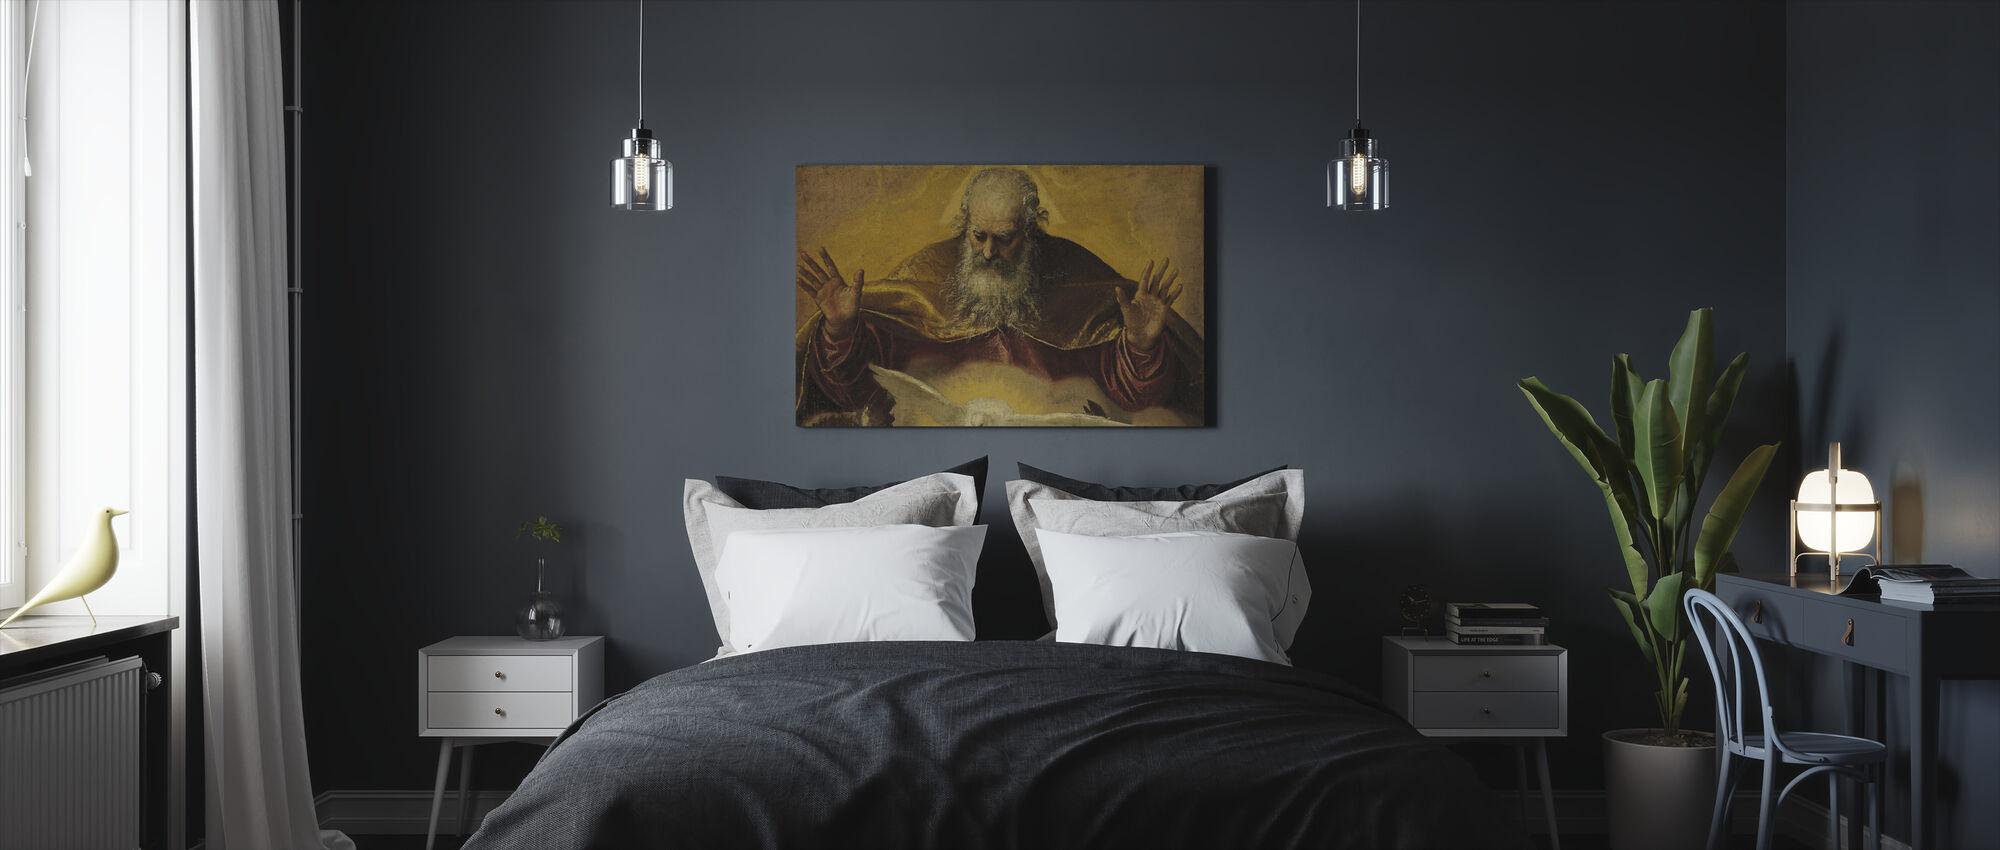 Eeuwige Vader - Paolo Veronese - Canvas print - Slaapkamer